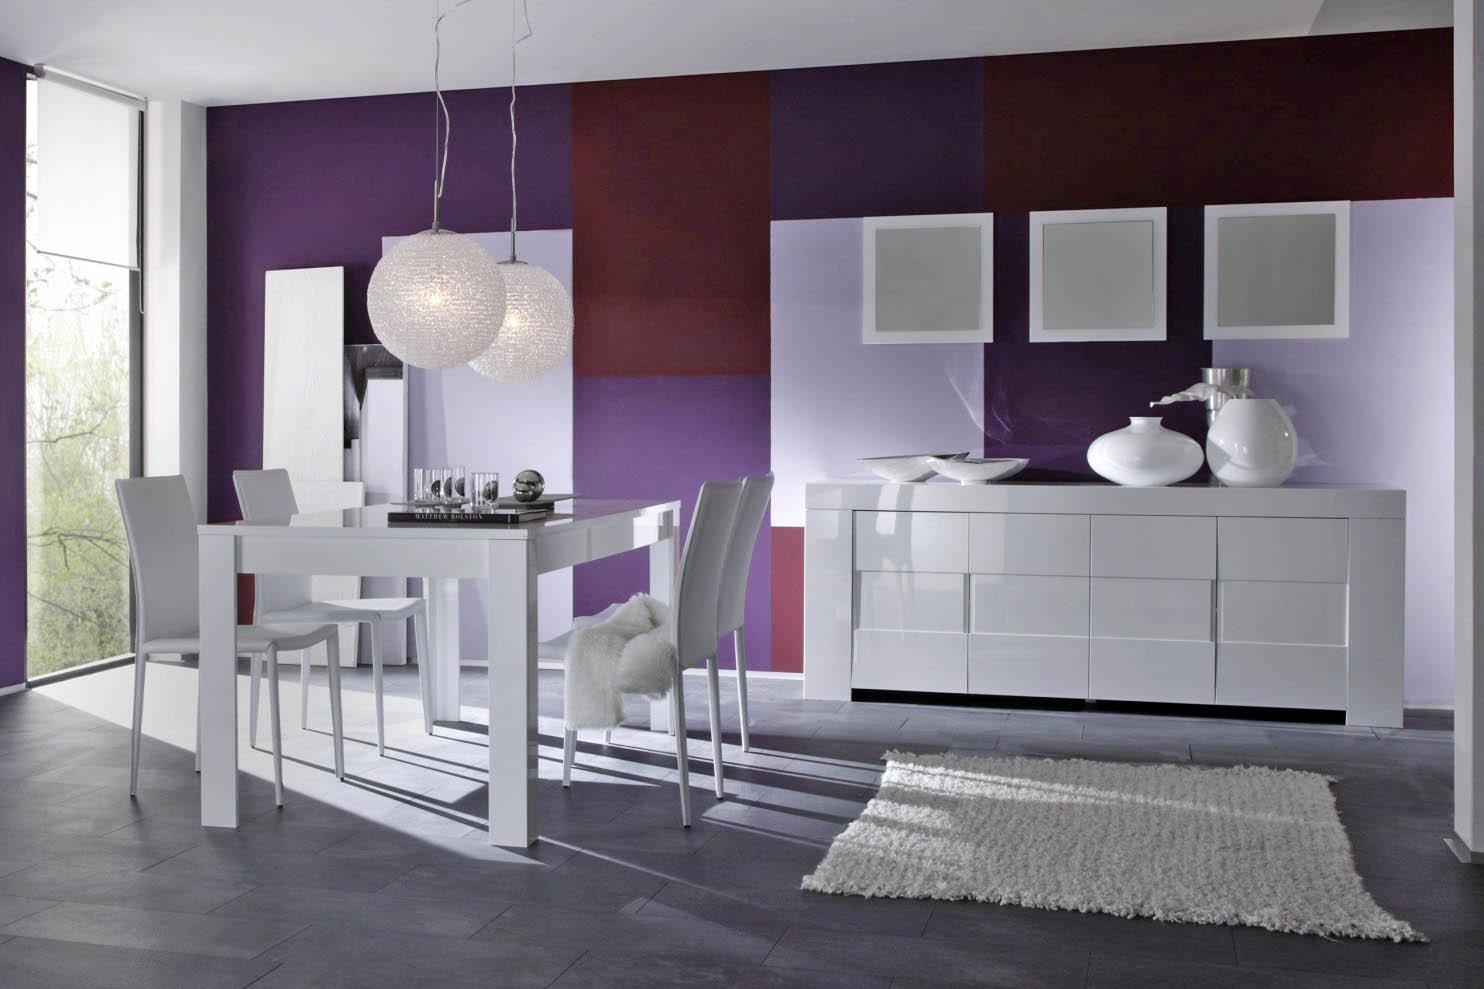 architecte d 39 int rieur marseille alain martin. Black Bedroom Furniture Sets. Home Design Ideas